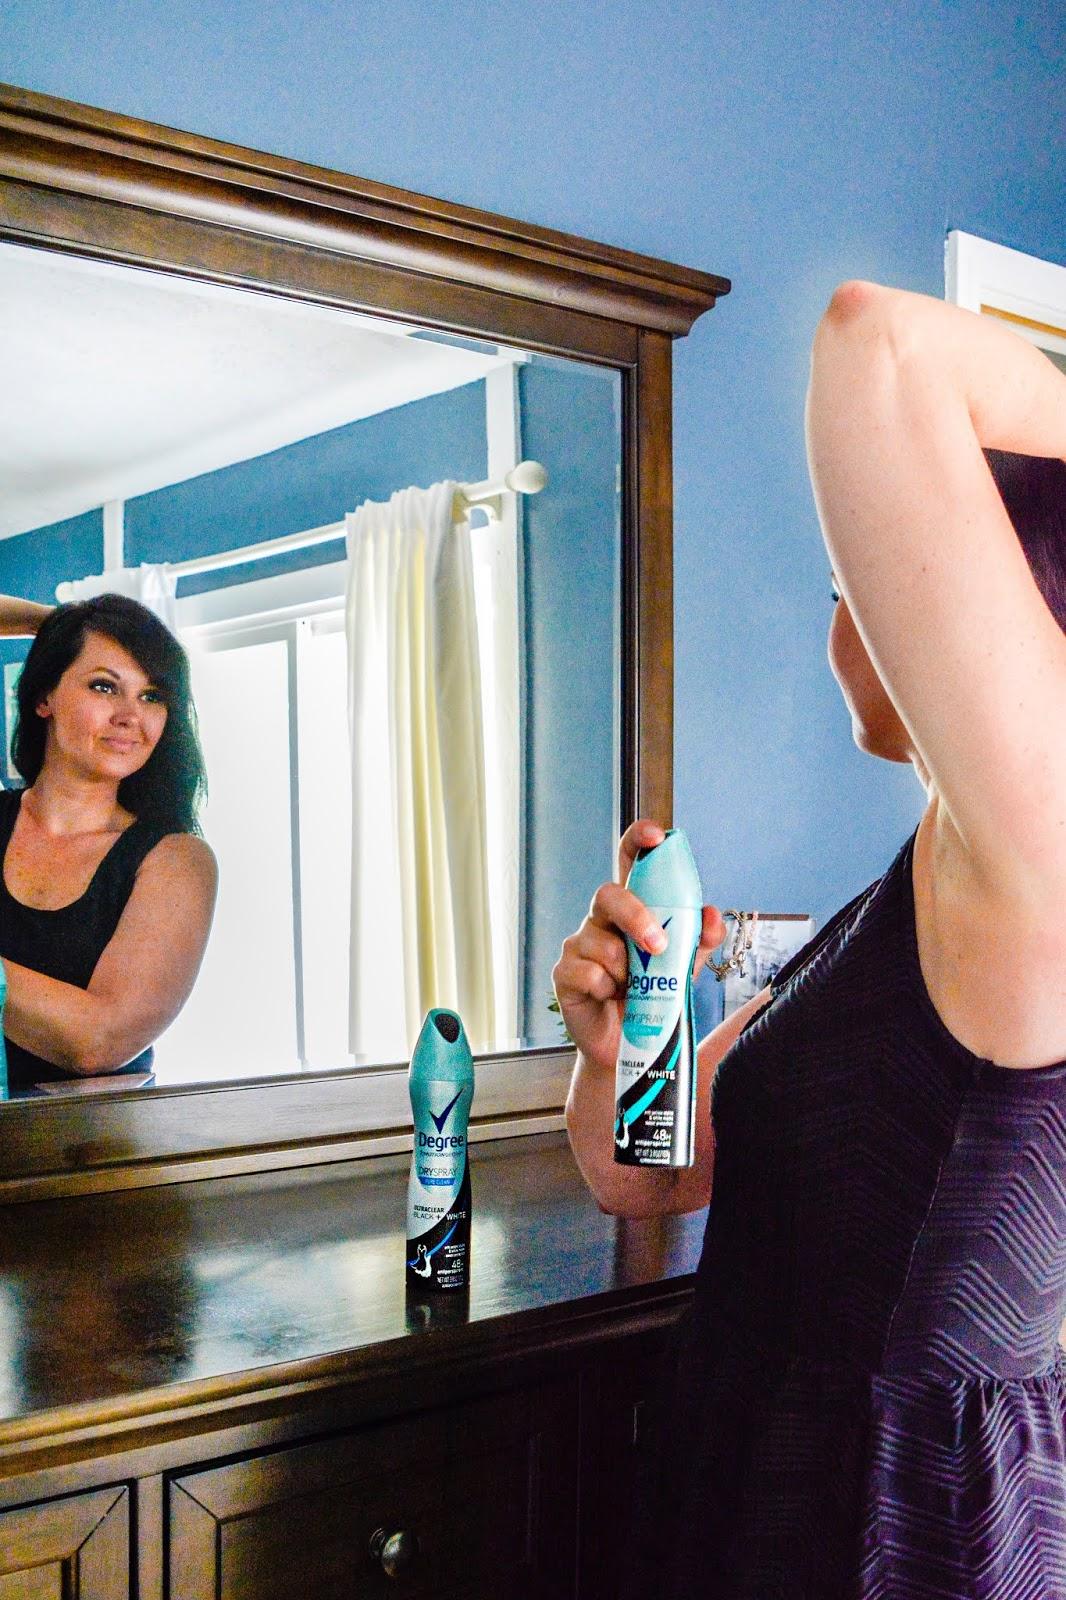 Degree UltraClear Black + White Antiperspirant Deodorant Dry Spray